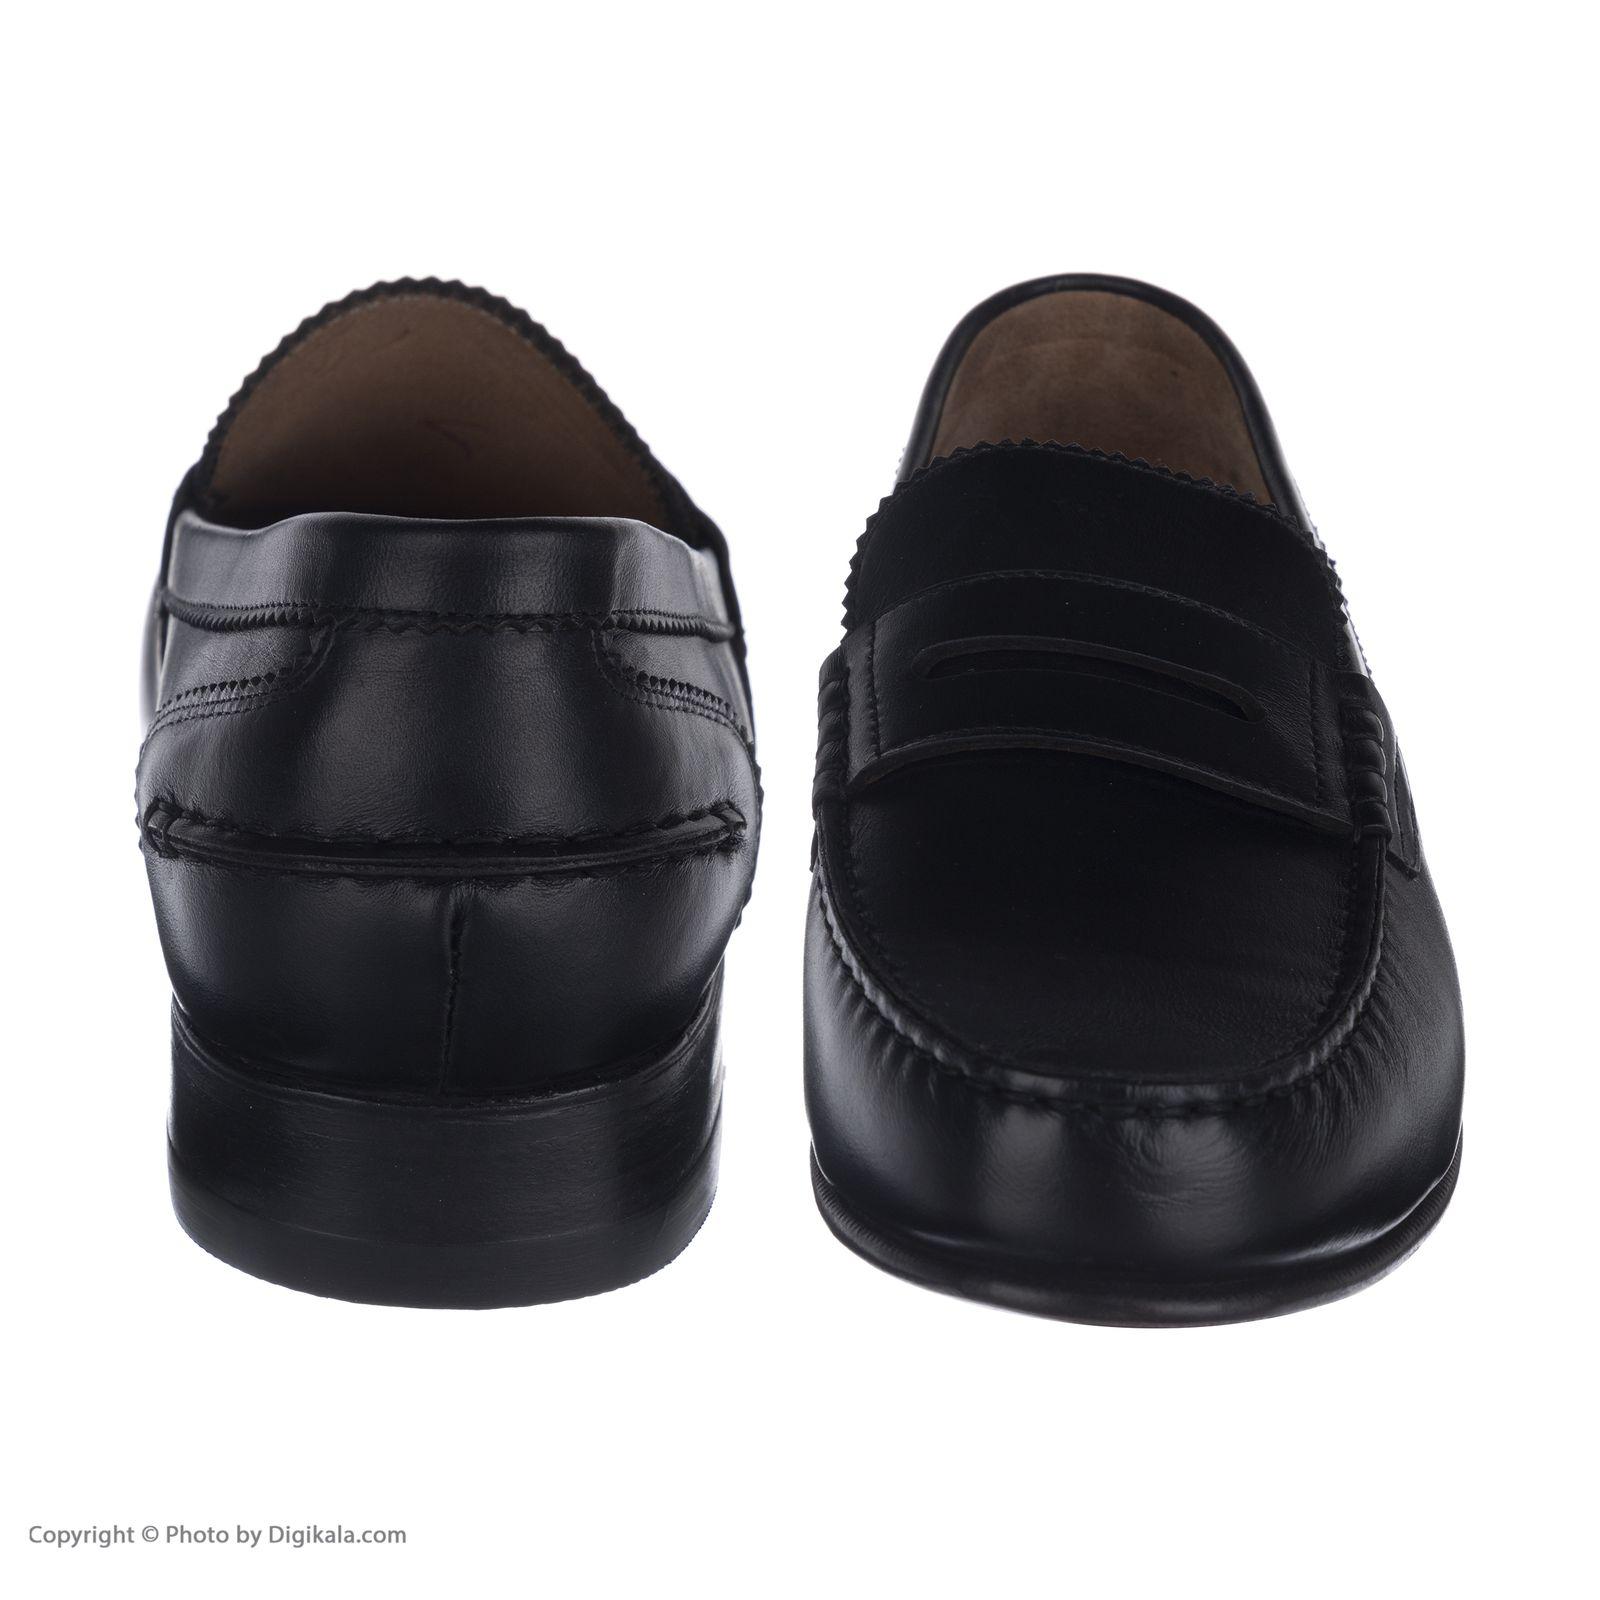 کفش مردانه نظری کد 410 -  - 2